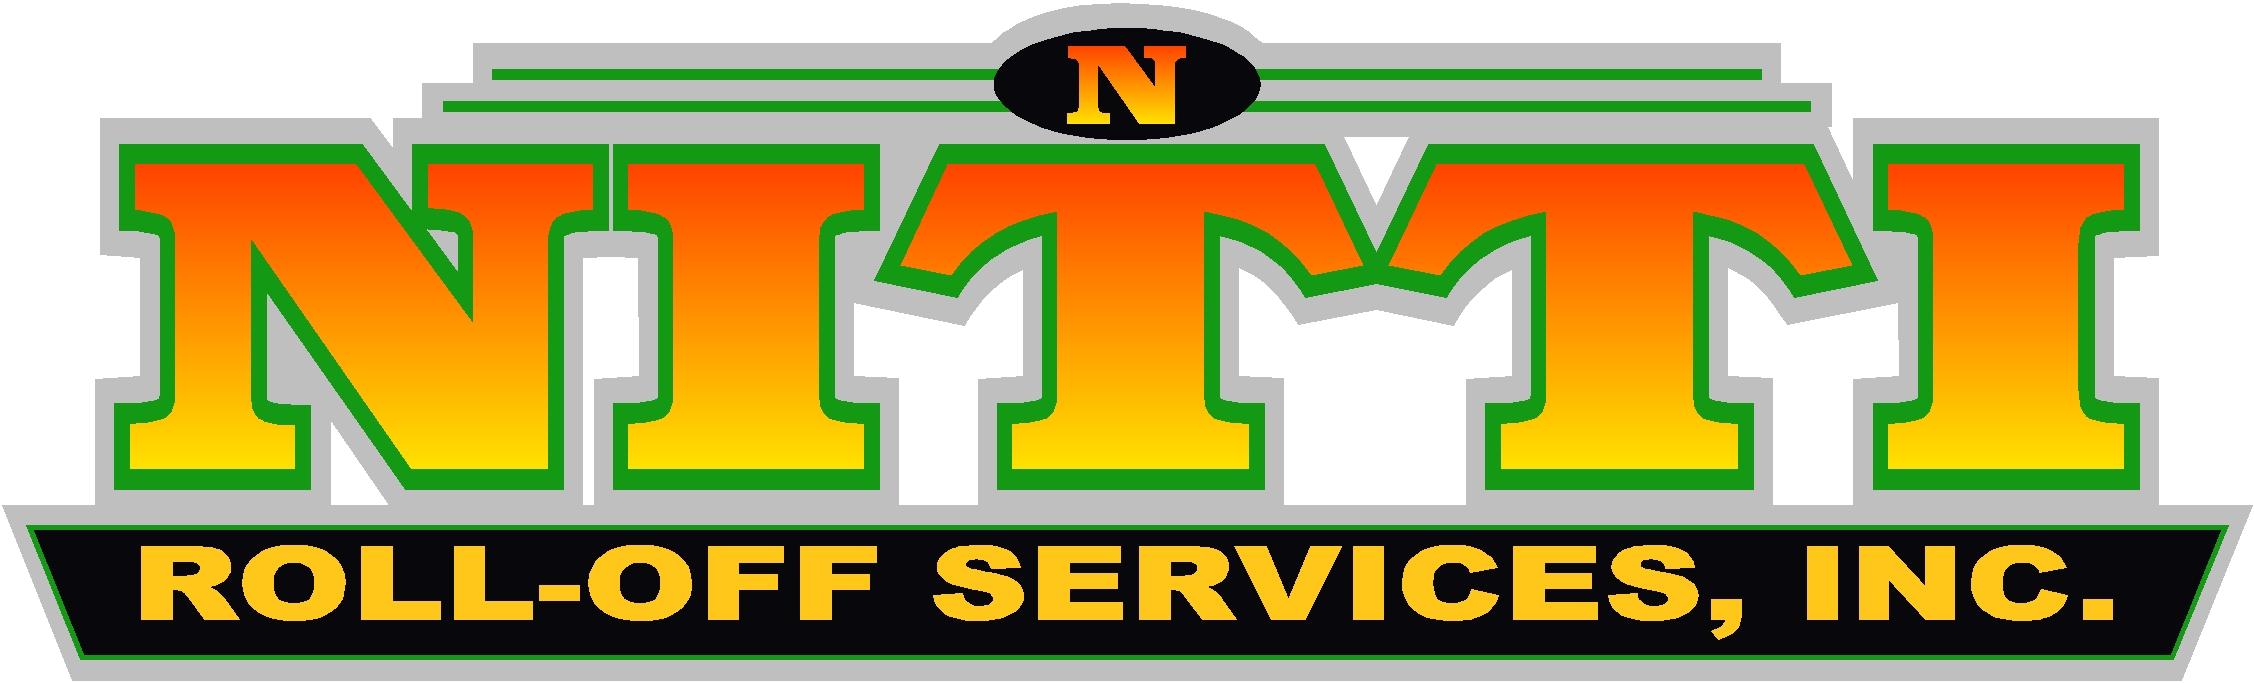 Nittis_rolloff-contracting_Logo_8_15